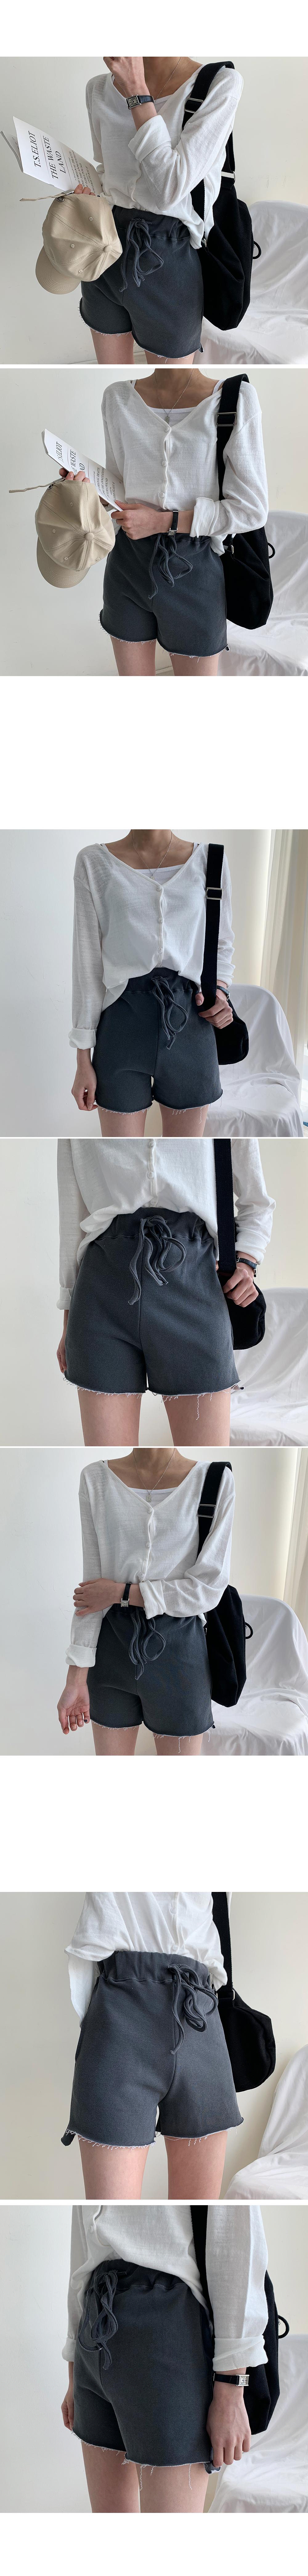 Pigment Training Shorts